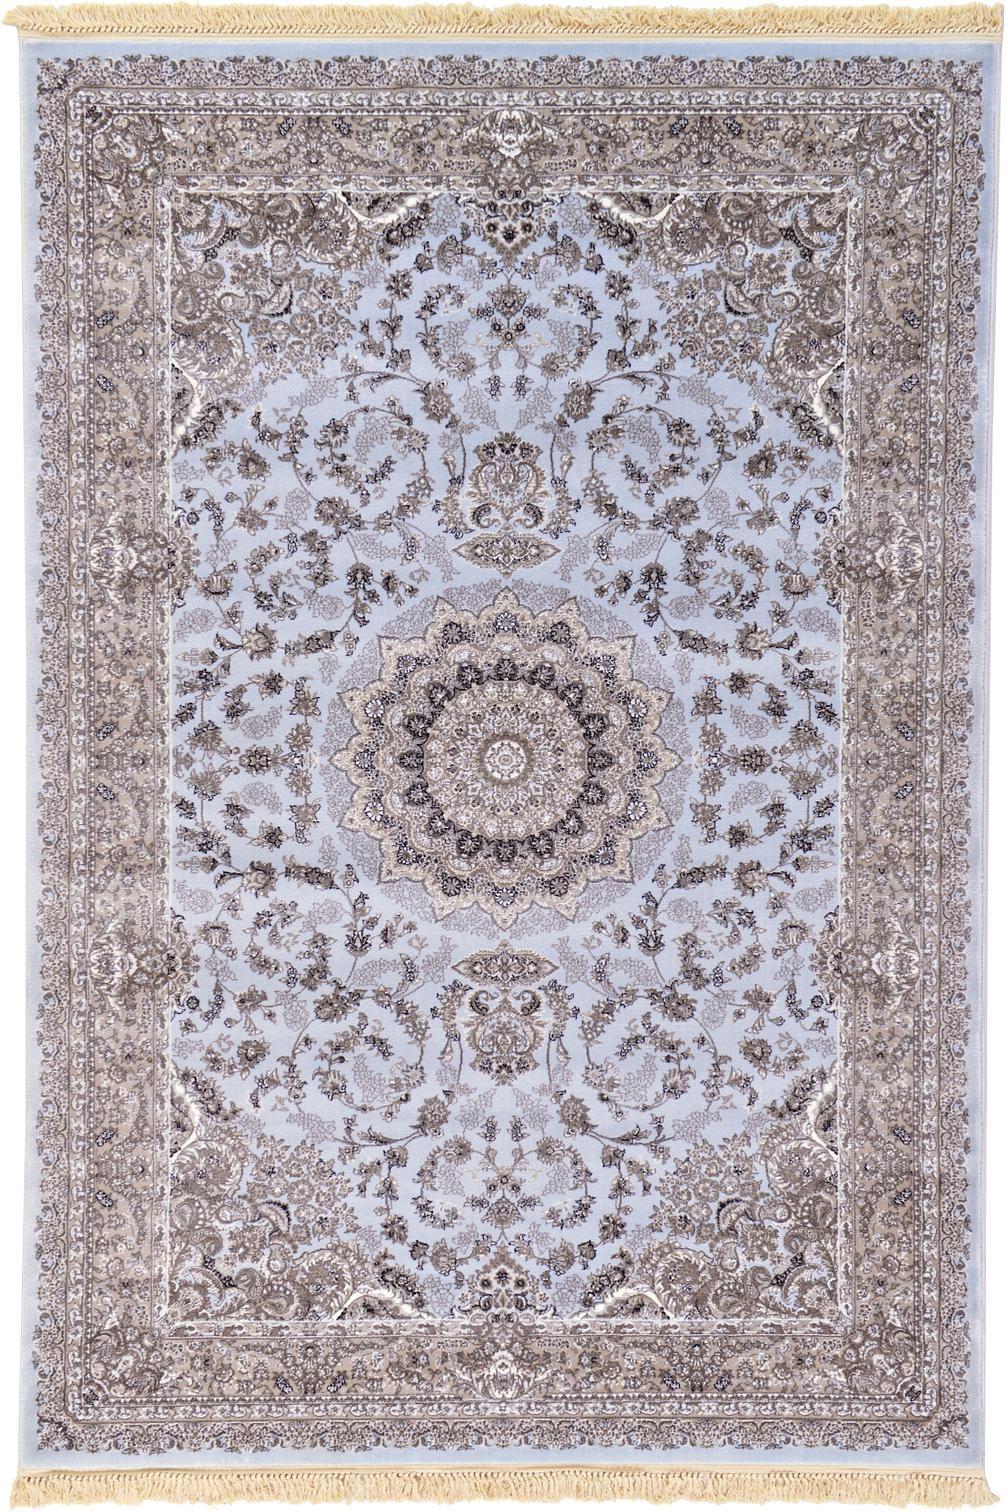 Light Blue 6 7 X 9 9 Isfahan Design Rug Area Rugs Esalerugs